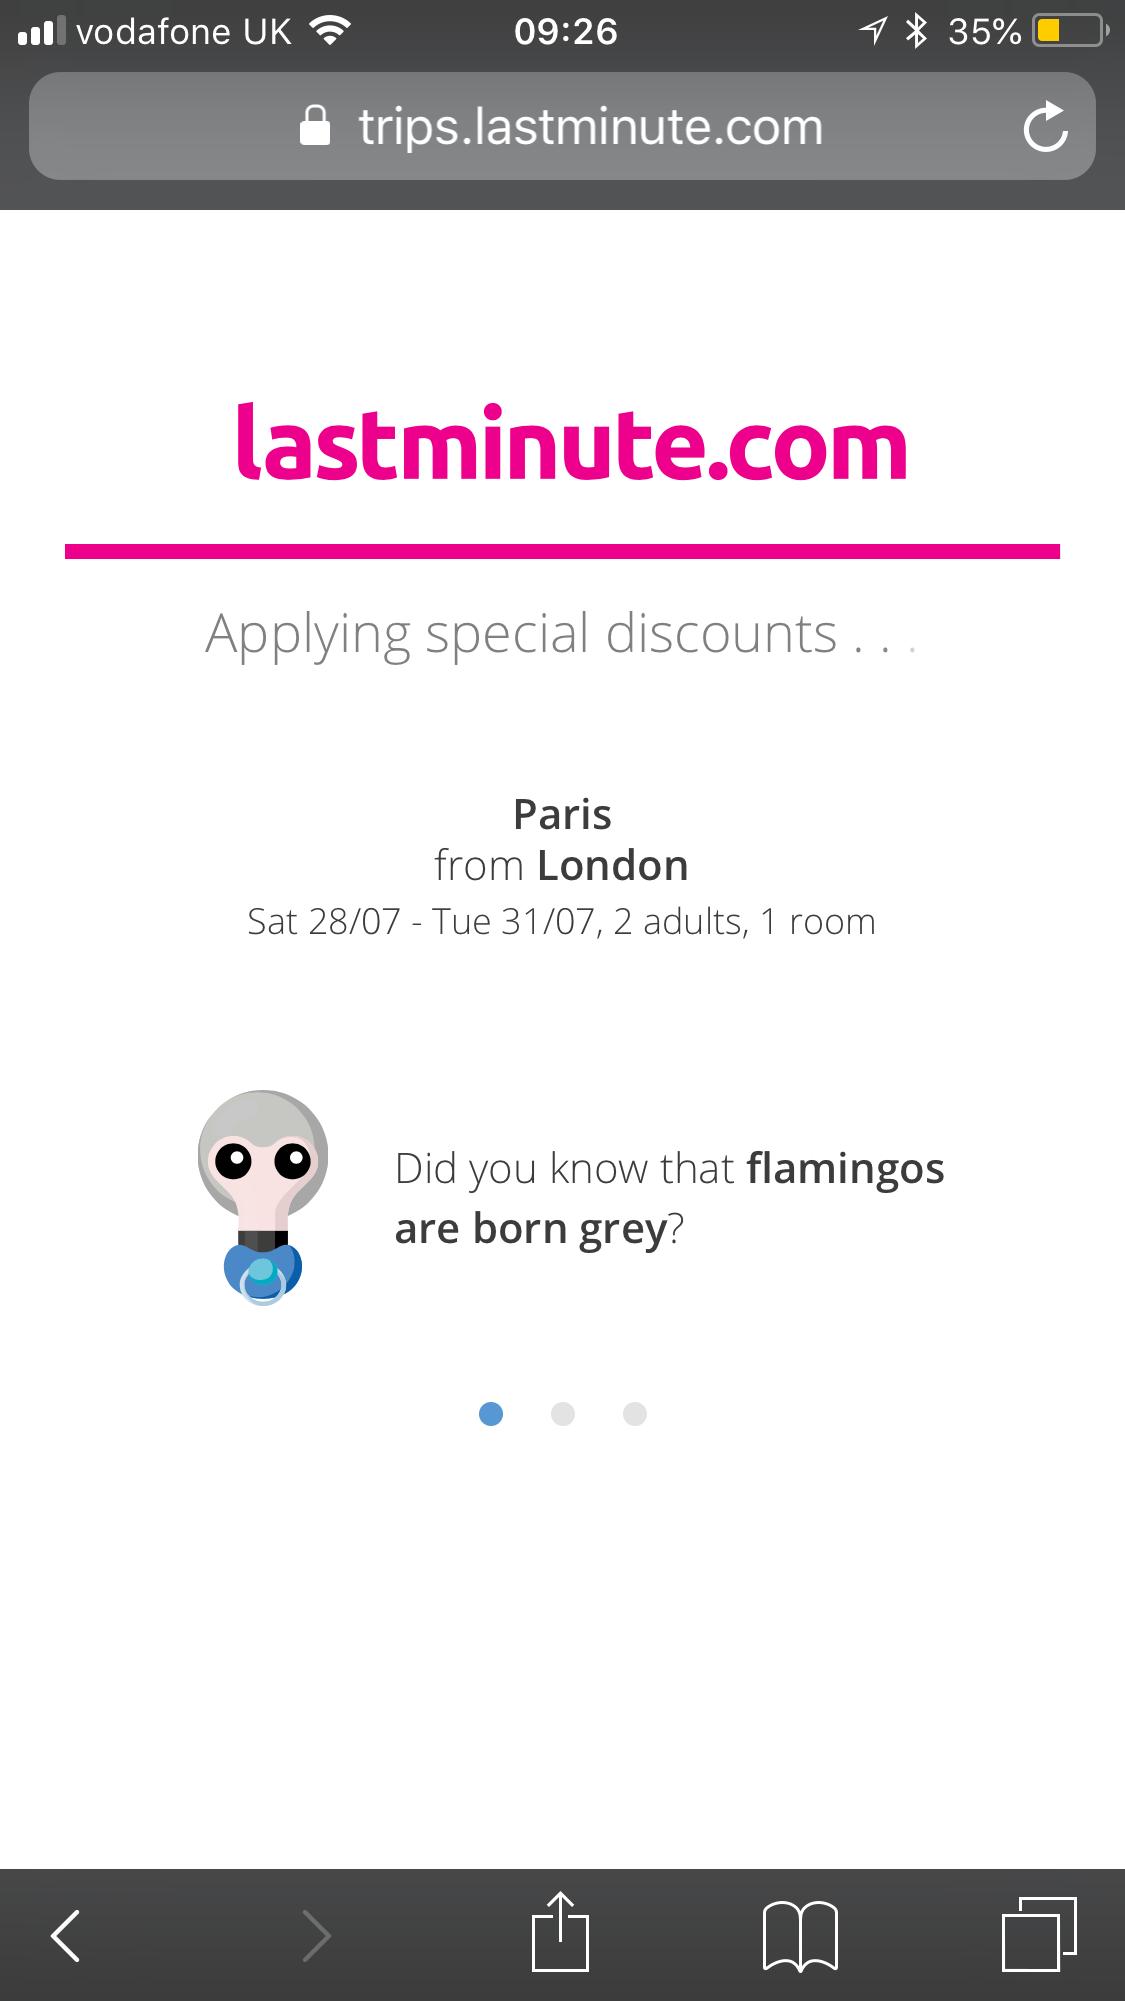 lastminute.com loading